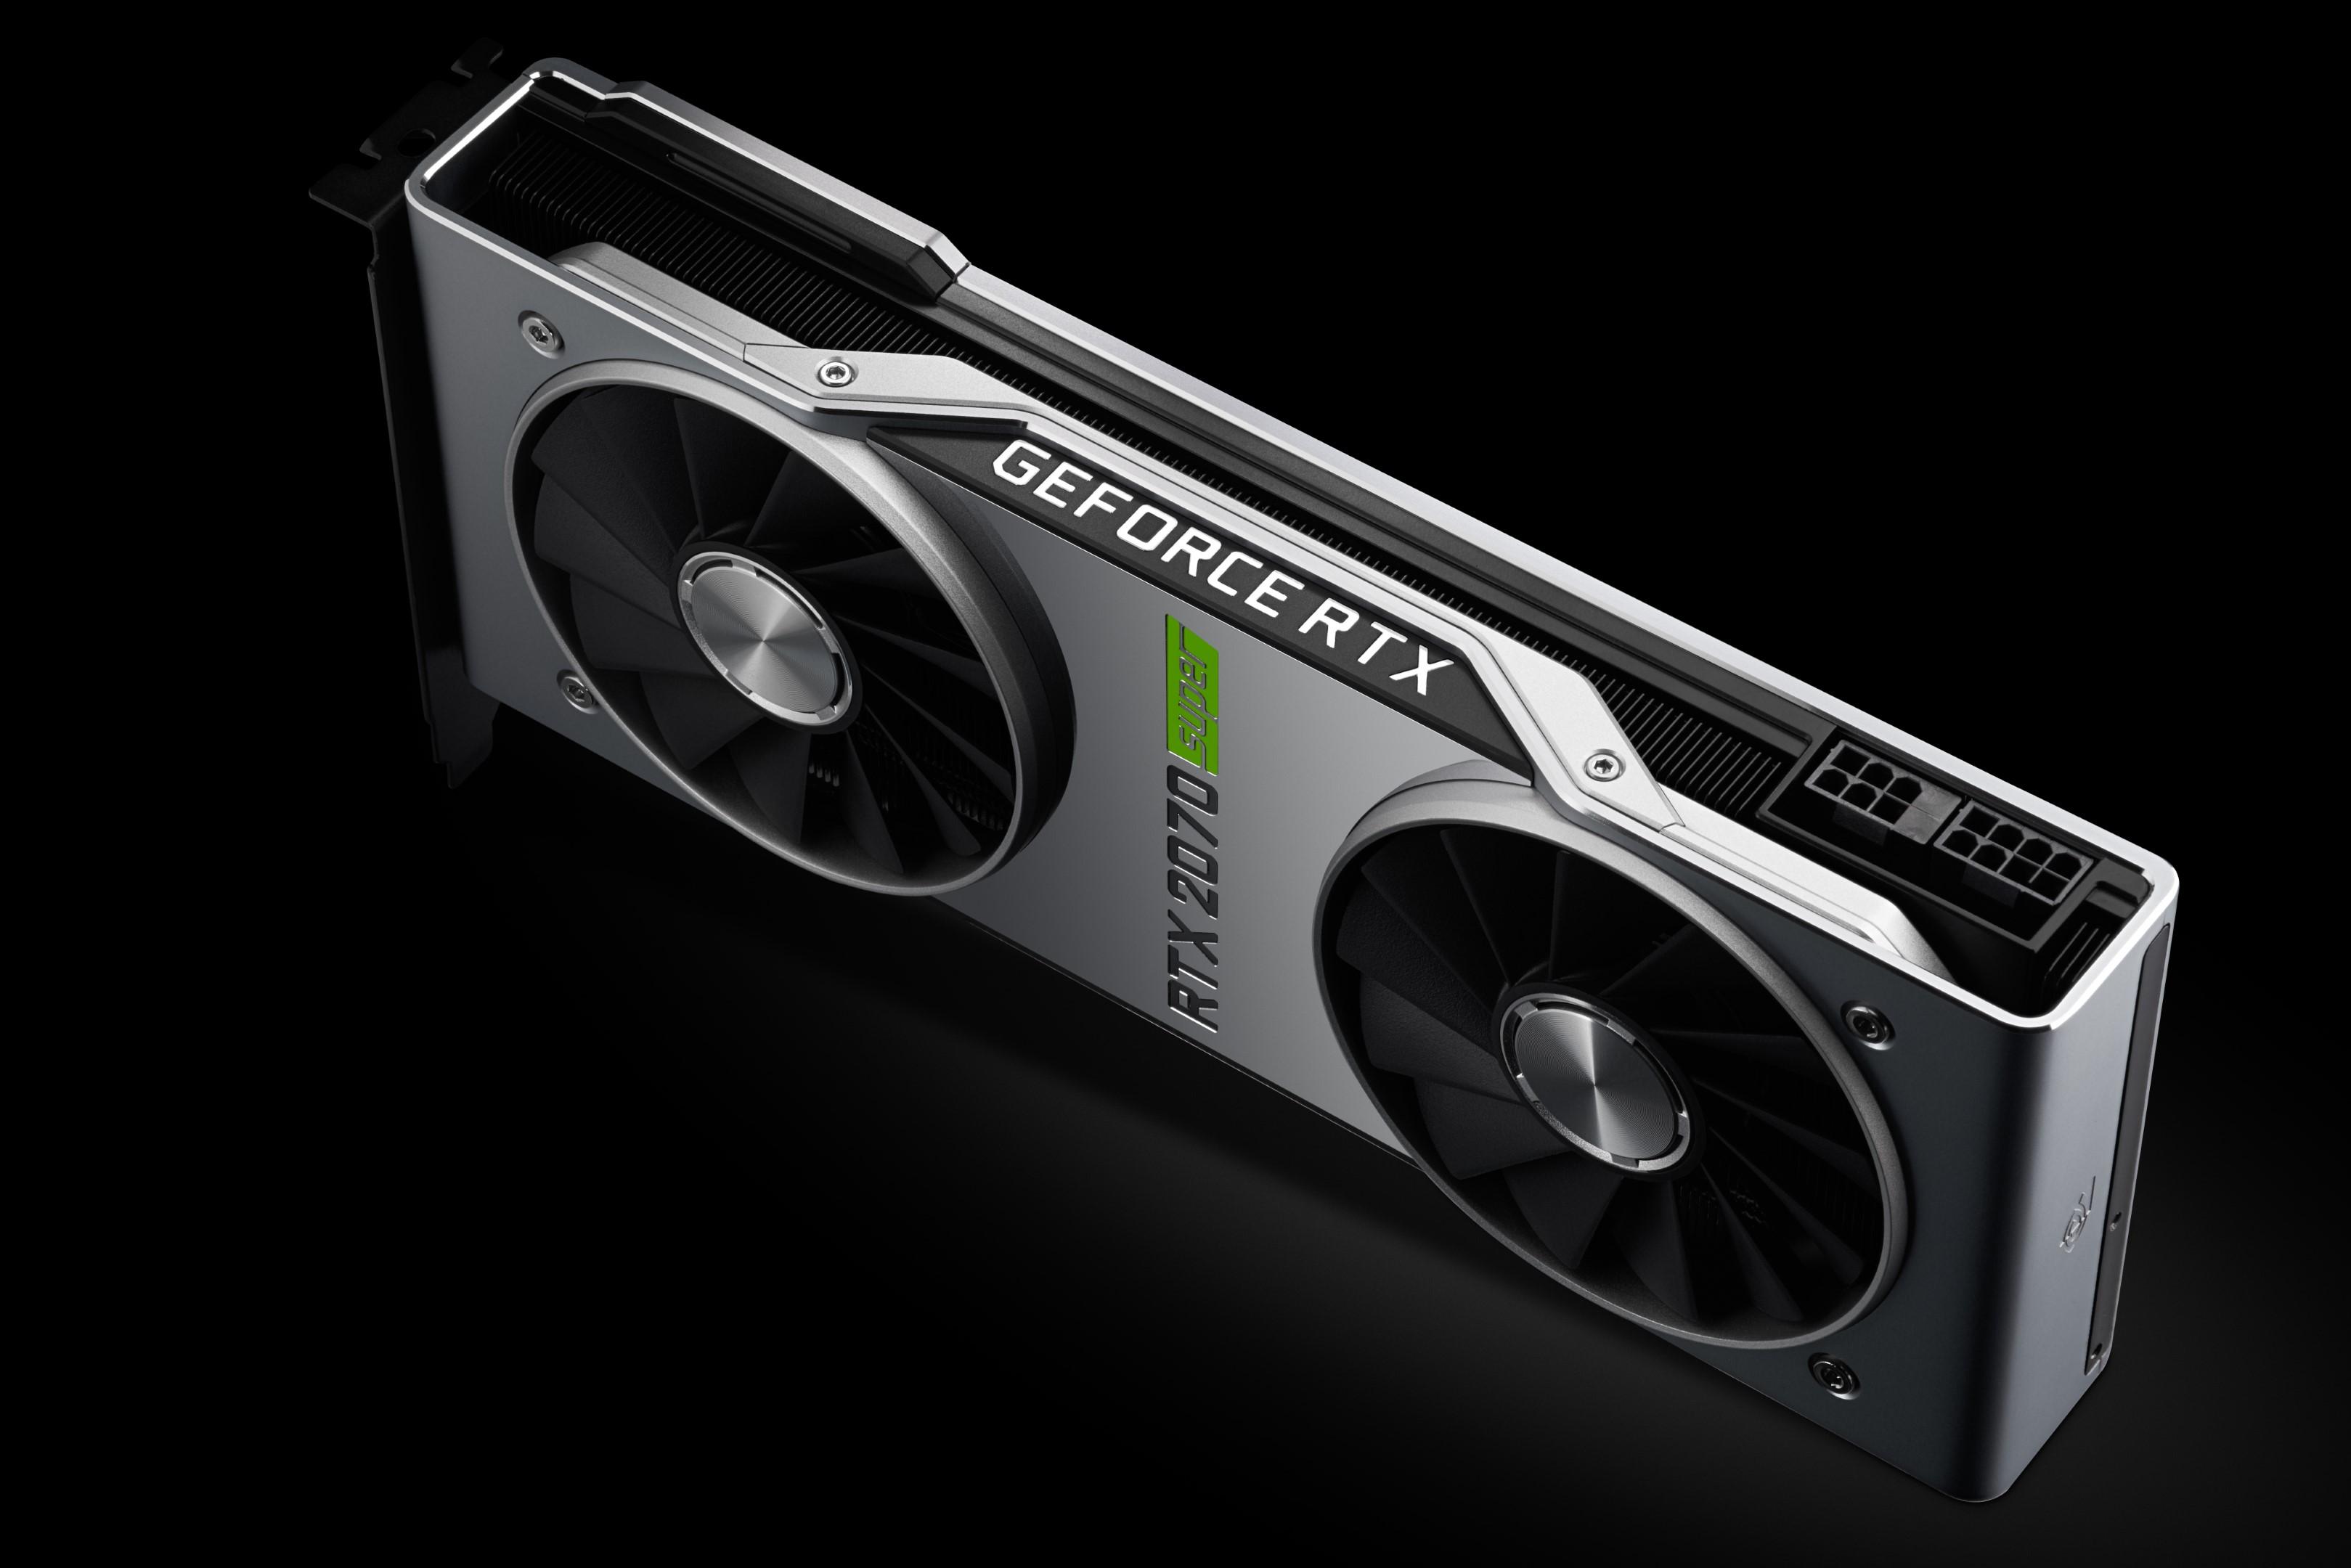 ZOTAC GeForce RTX 2080 SUPER AMP Extreme - Full TU104 Amped Up